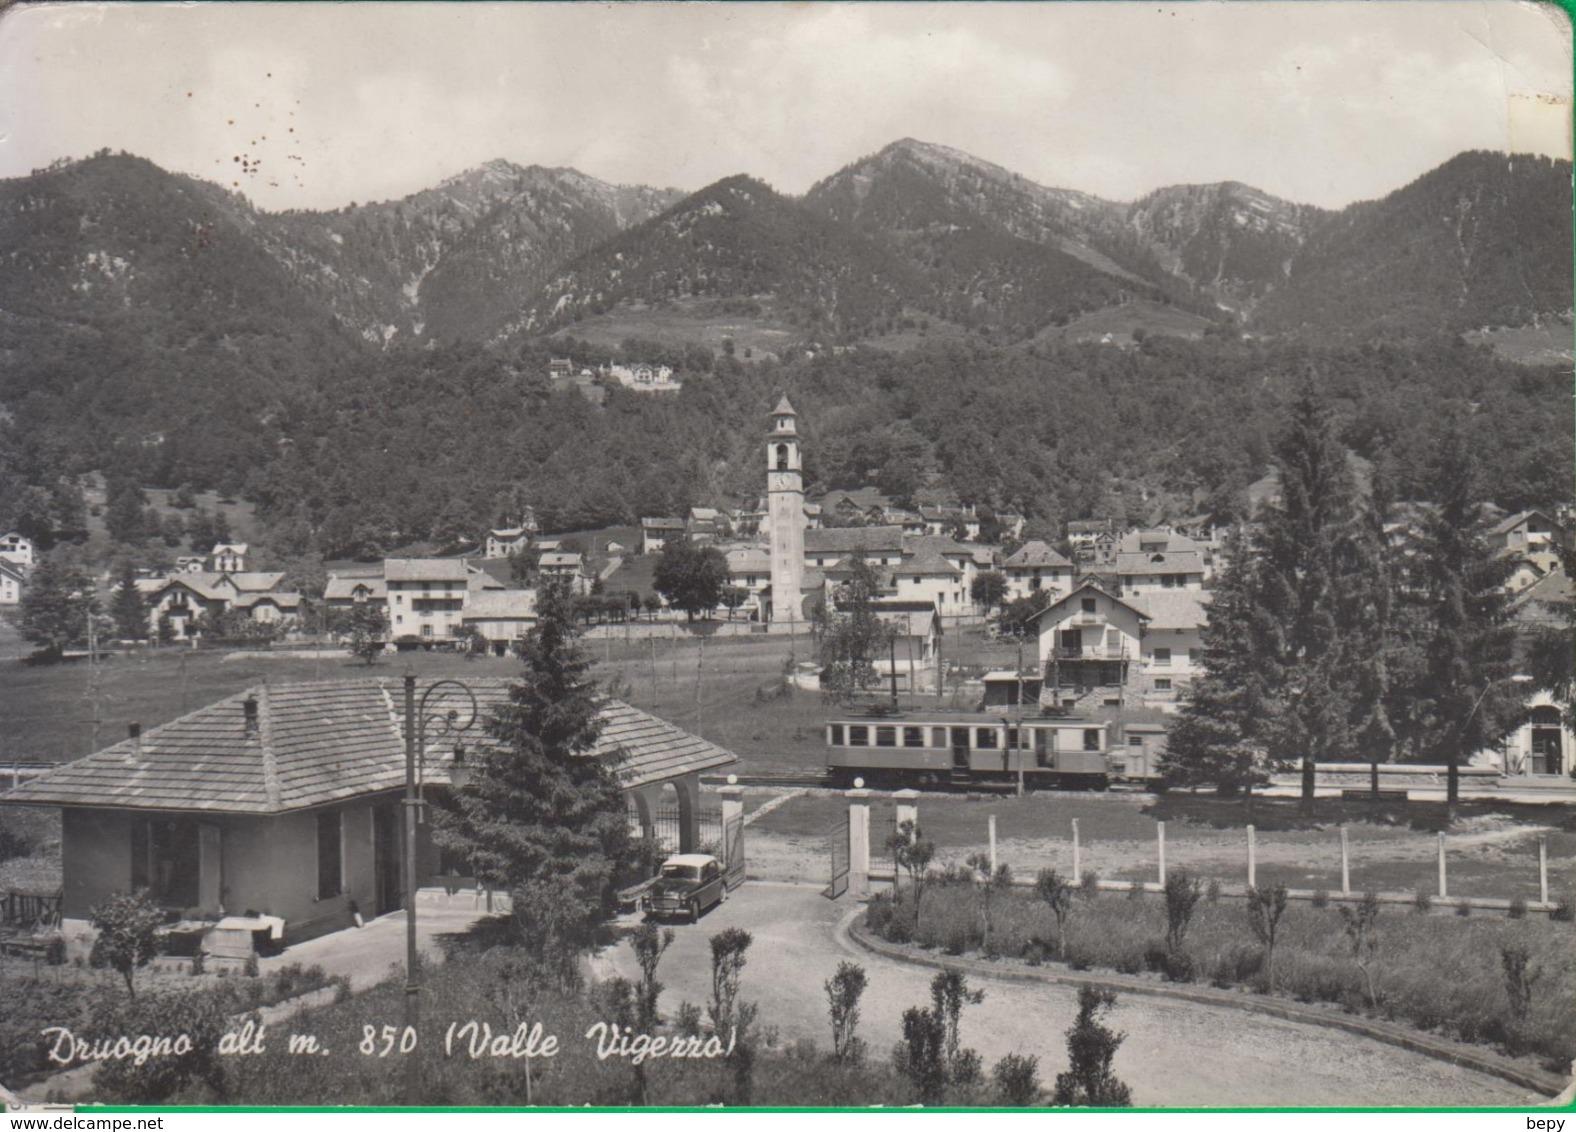 DRUOGNO. Valle Vigezzo. Tram. Treno. Chiesa. 19a - Novara